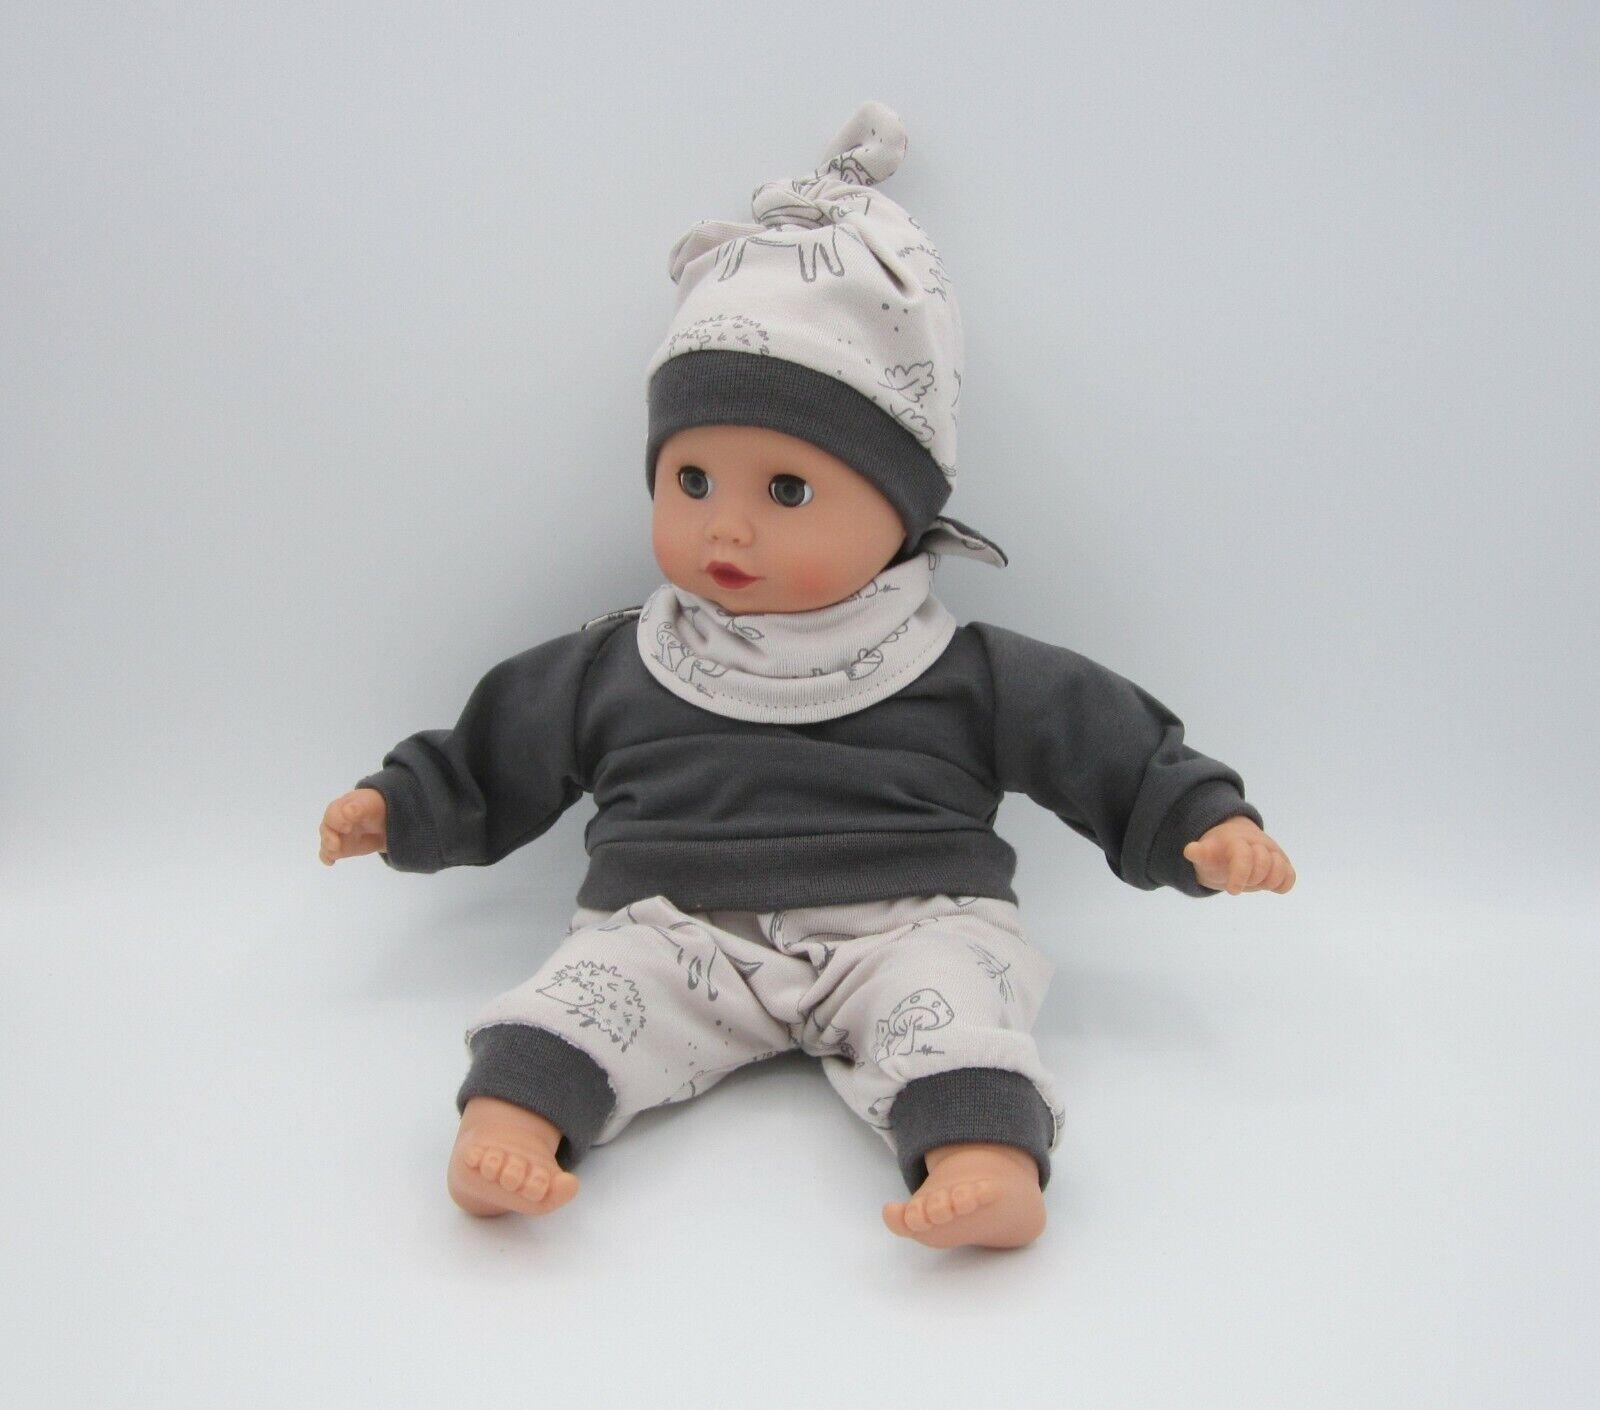 05 3 tlg Puppenkleidung Set für JAKO-O Puppe Krümel 43cm NEU